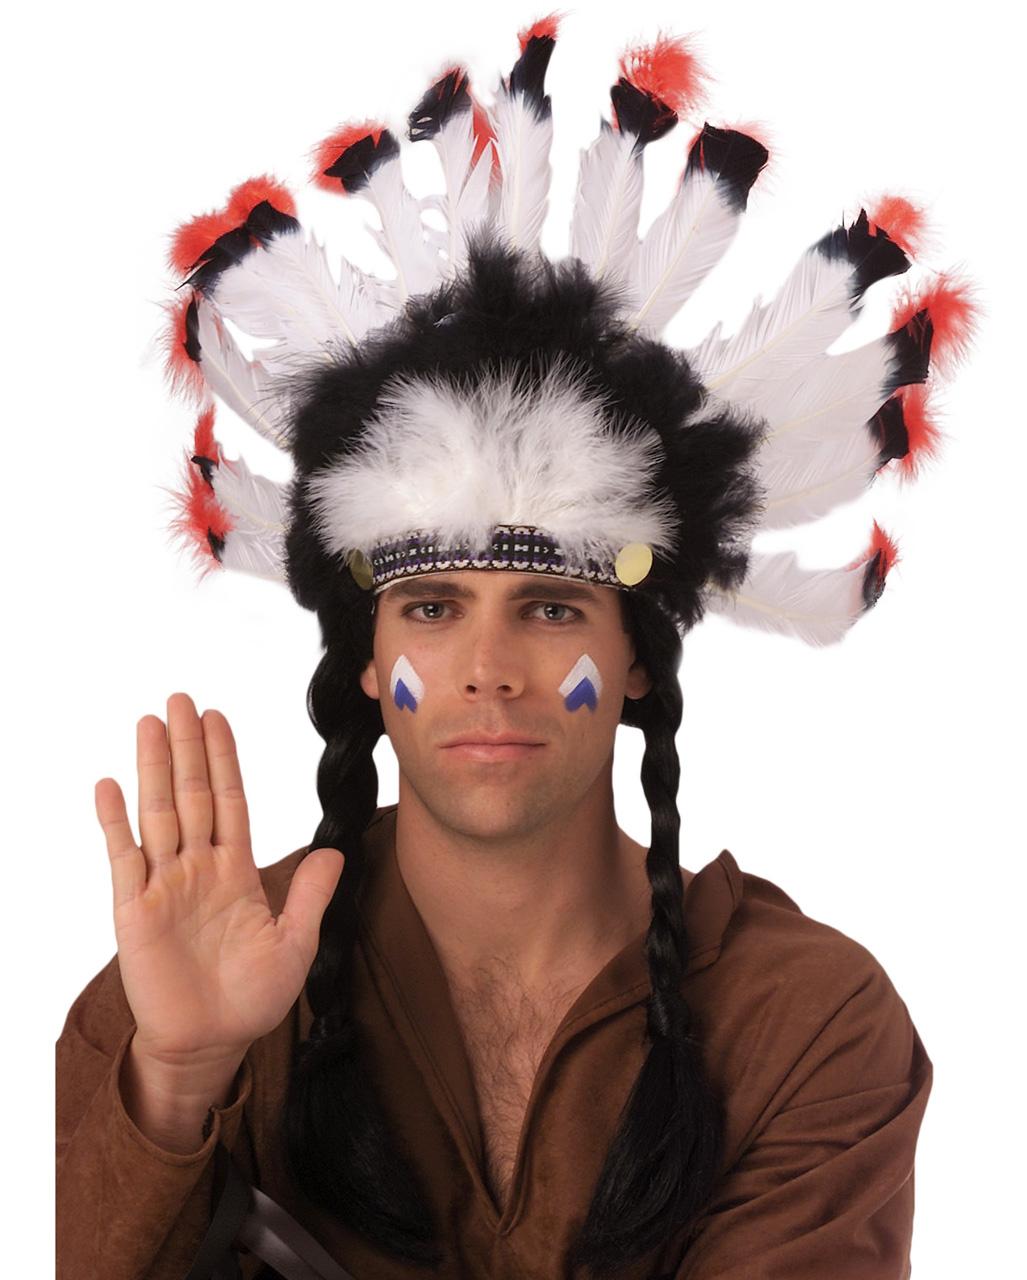 Native American Indian Feather Headdress Cosplay Party Fancy Dress Headband